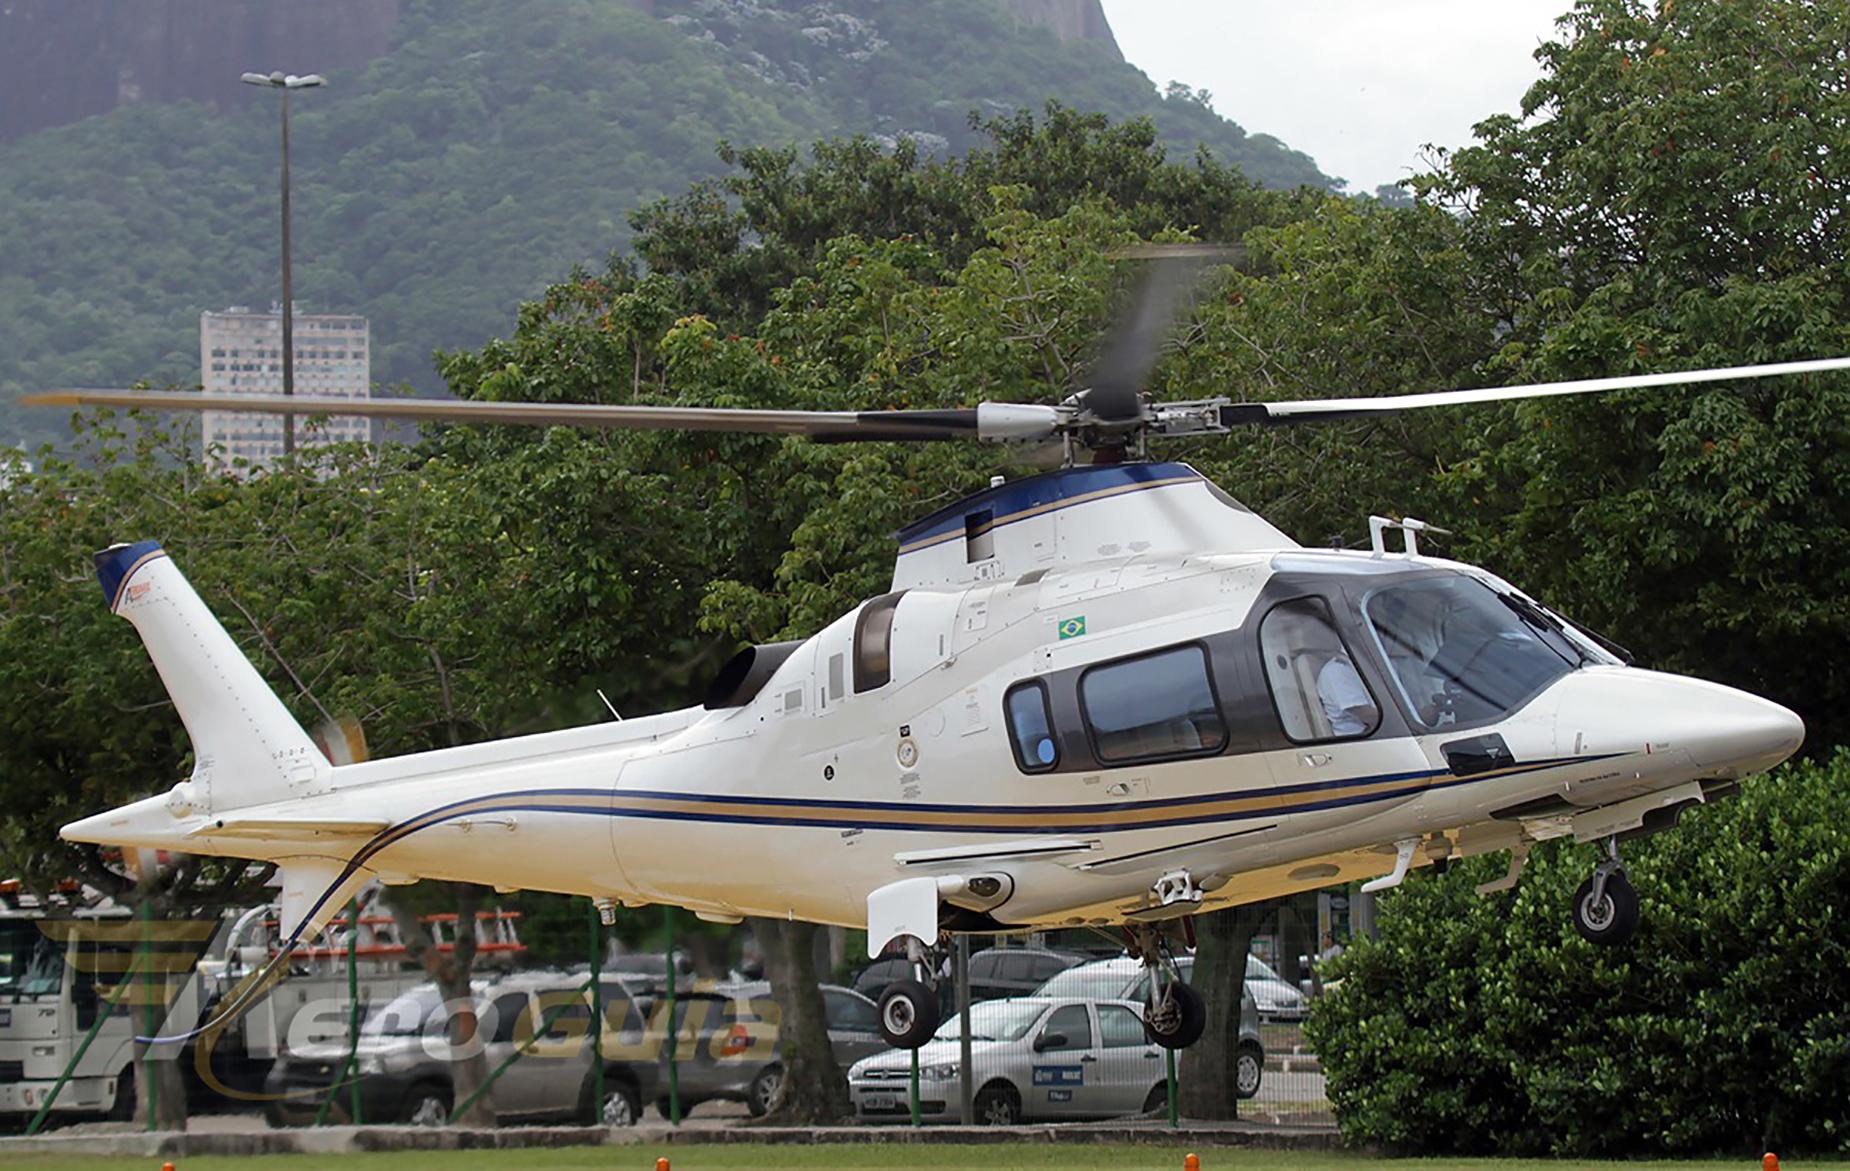 Agusta - A109E Power - 2009